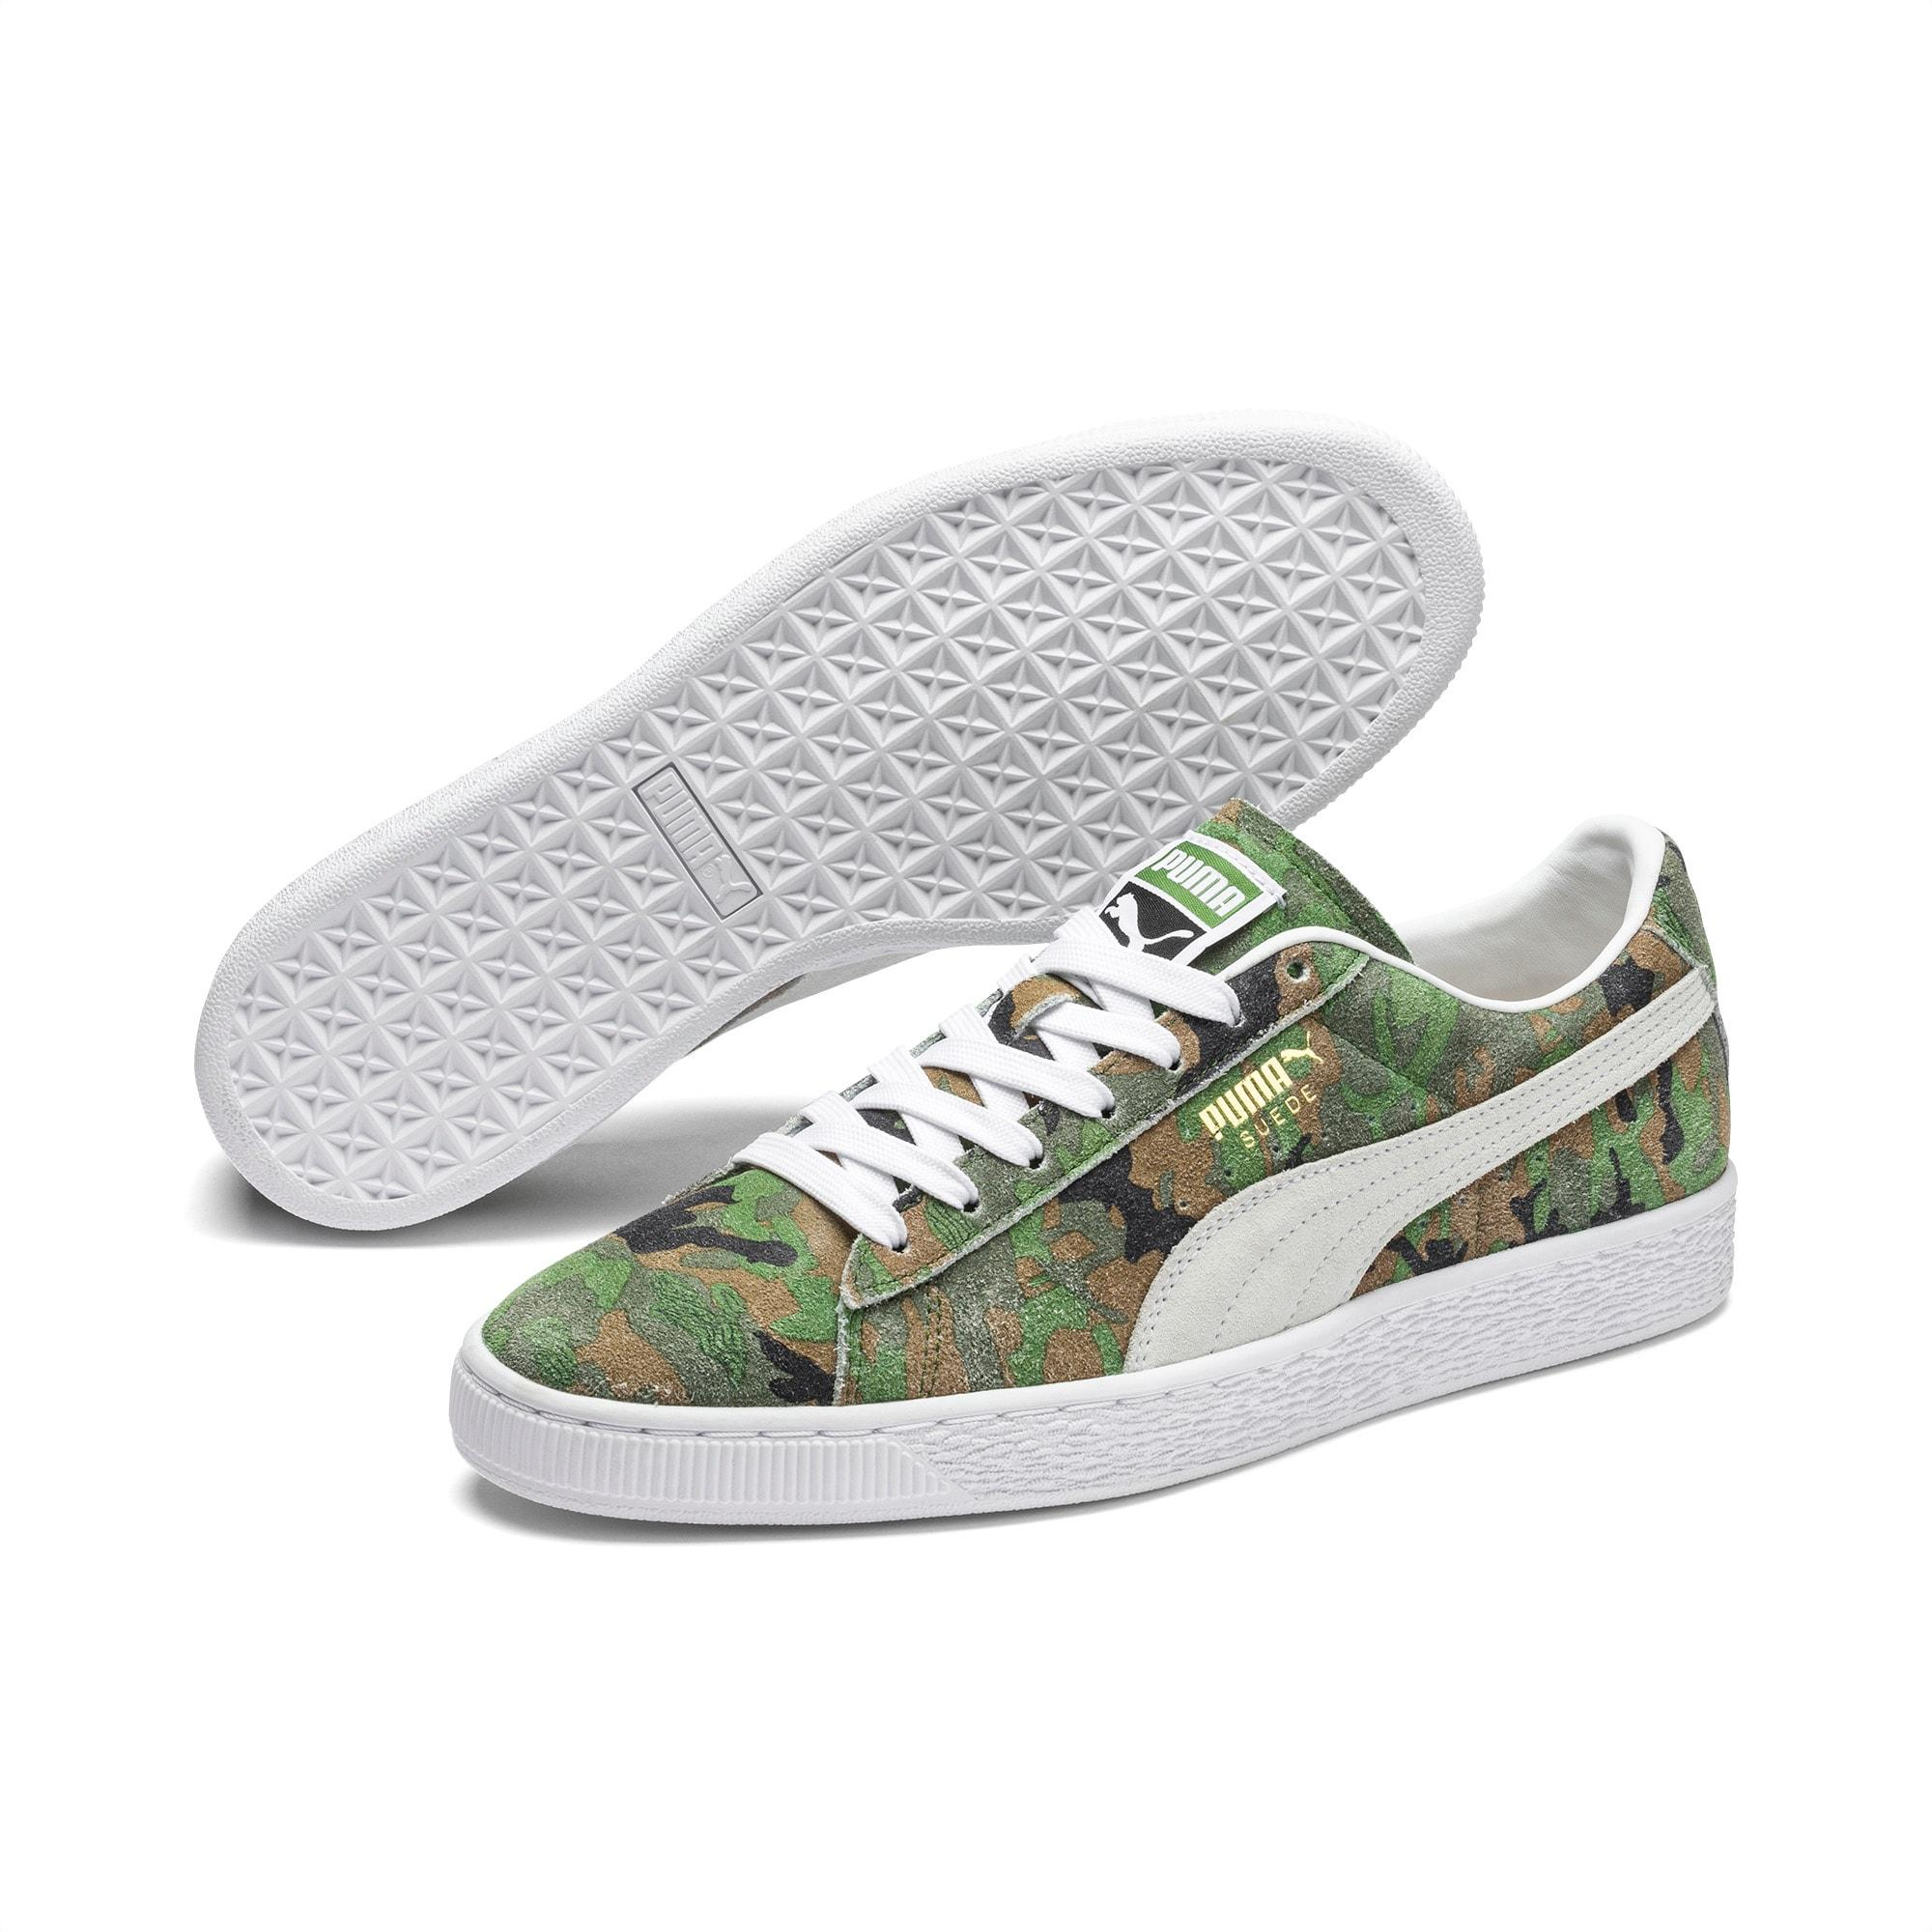 PUMA Suede Classic Ambush Men's Sneakers in Green for Men - Lyst